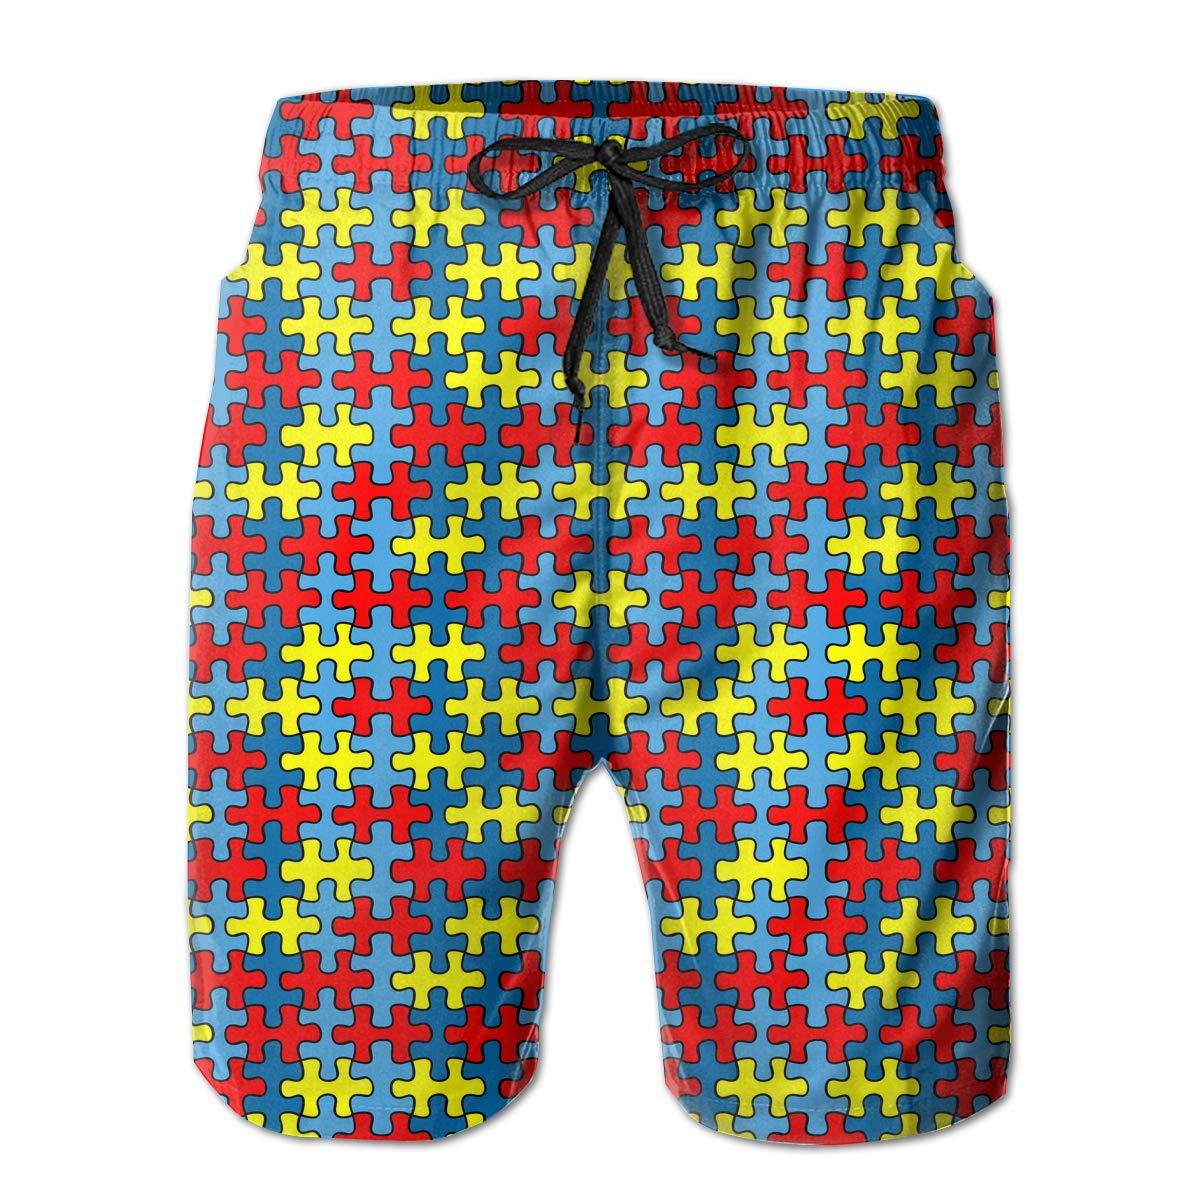 UHT28DG Autism Awareness Puzzle Pattern Mens Lightweight Boardshorts Surf Yoga Pockets Beachwear